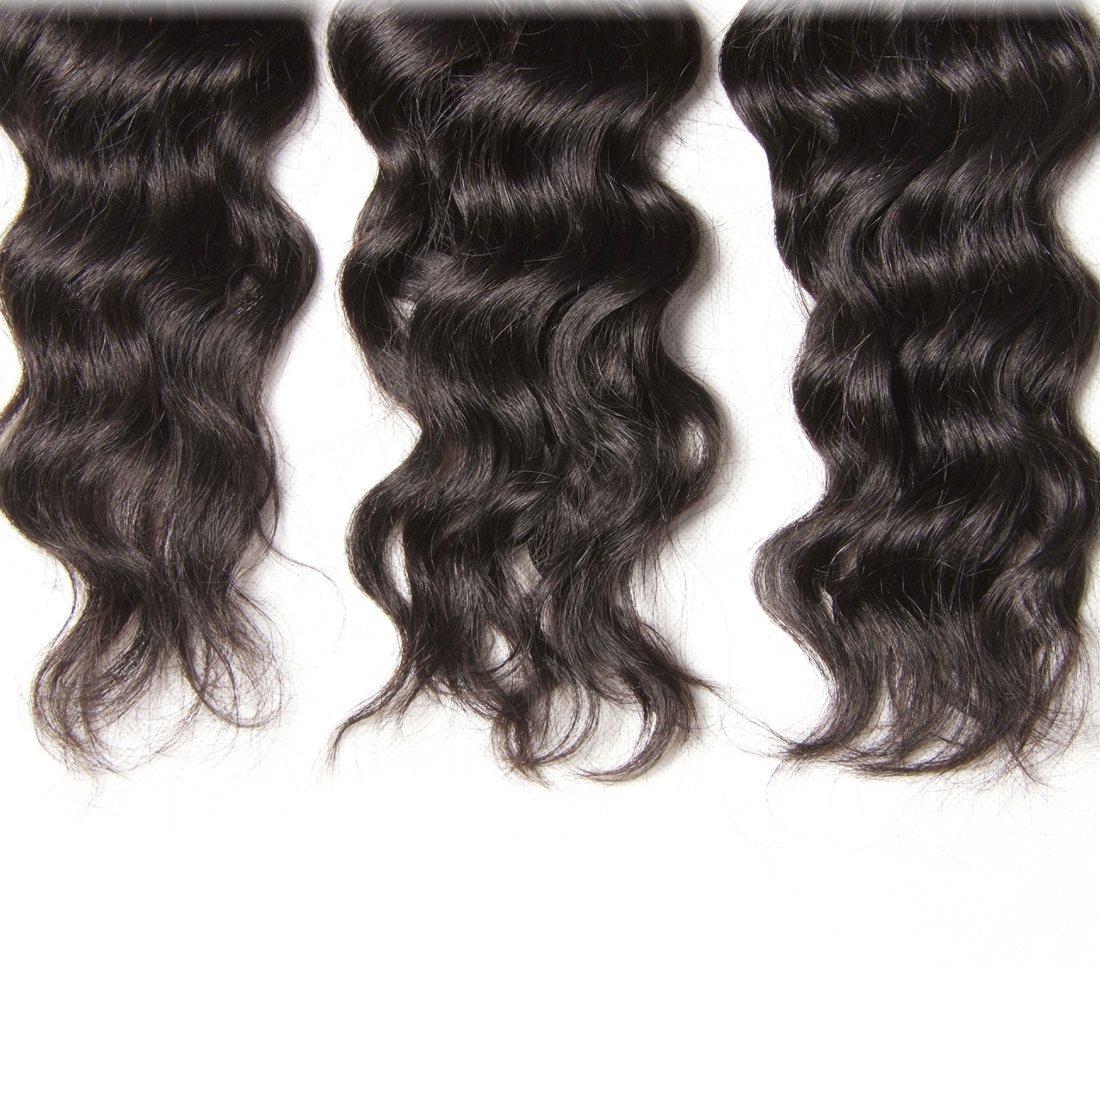 Unice 7A Grade Brazilian Natural Wave Hair 100% Virgin Human Hair 3 Bundles with Closure Natural Color (20 22 24+18Free Closure) by UNICE (Image #6)